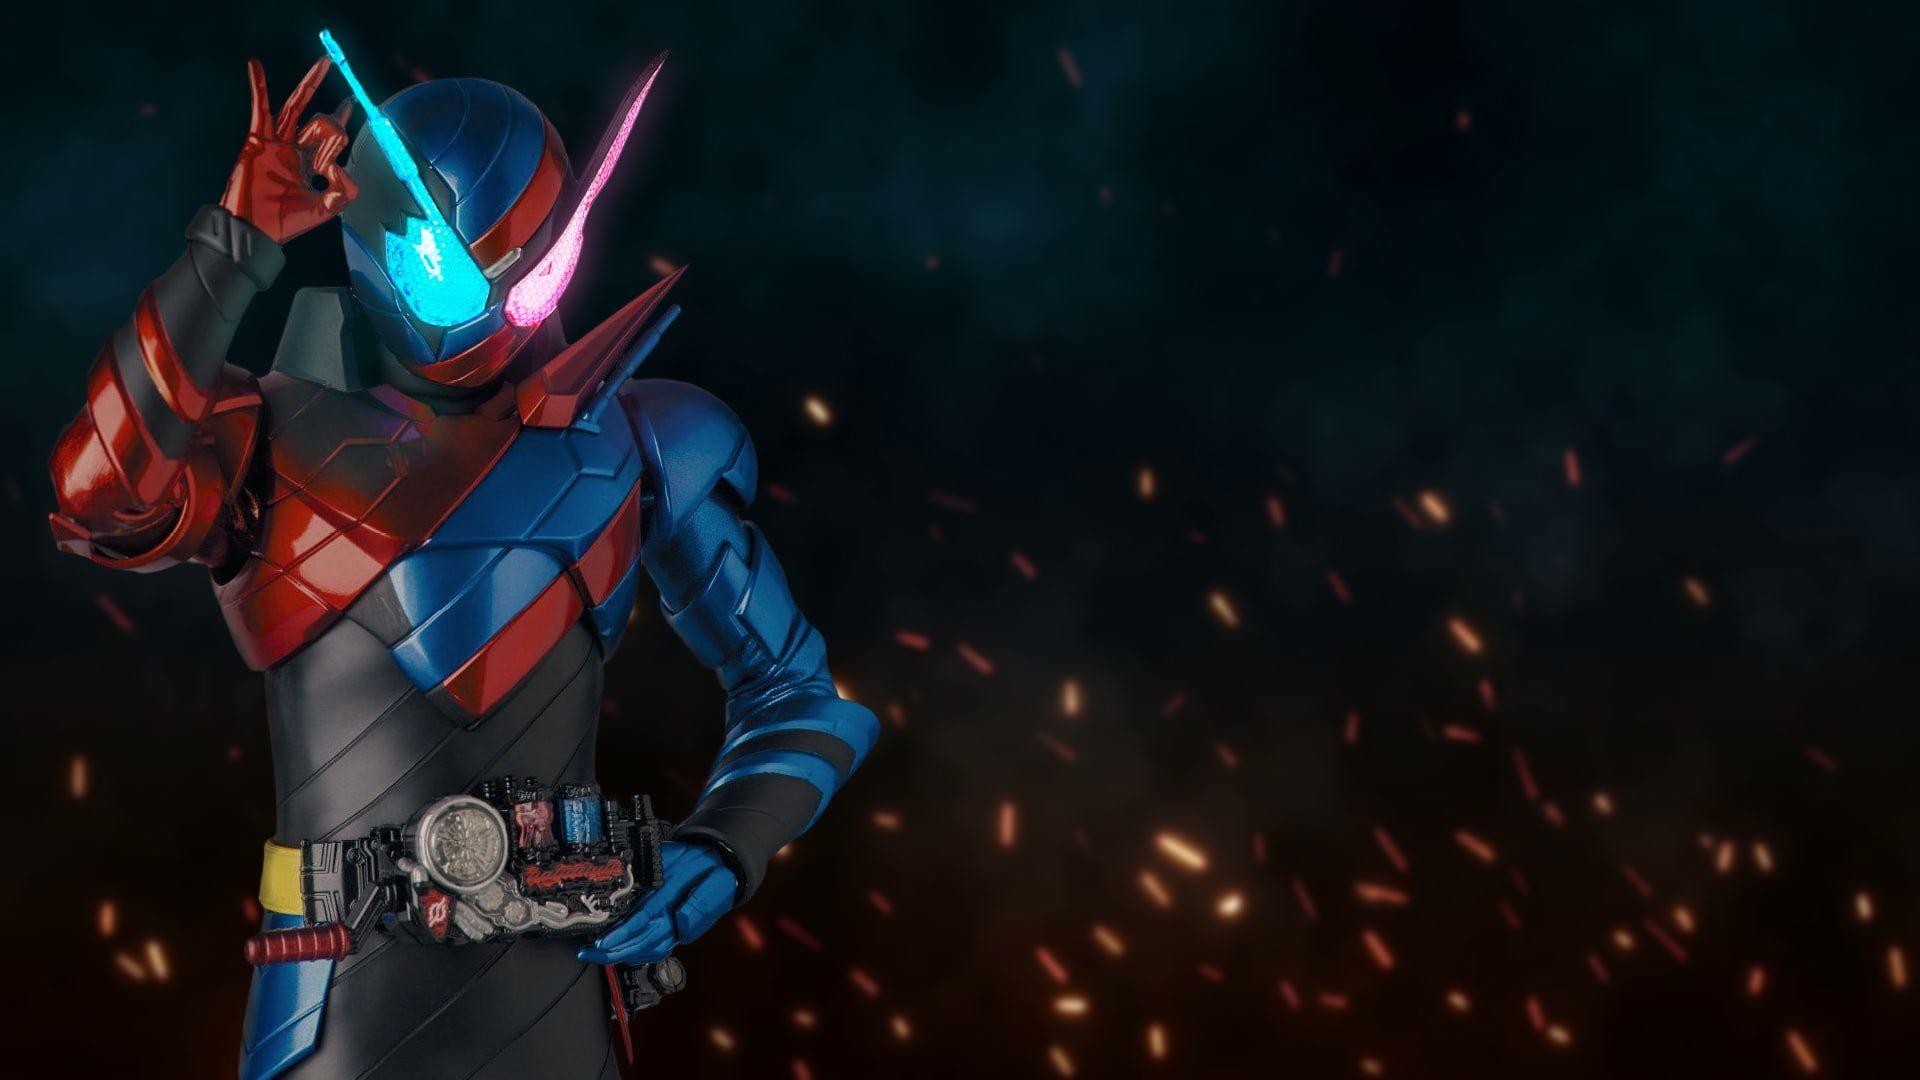 22+ Kamen Rider Wallpaper  Gif